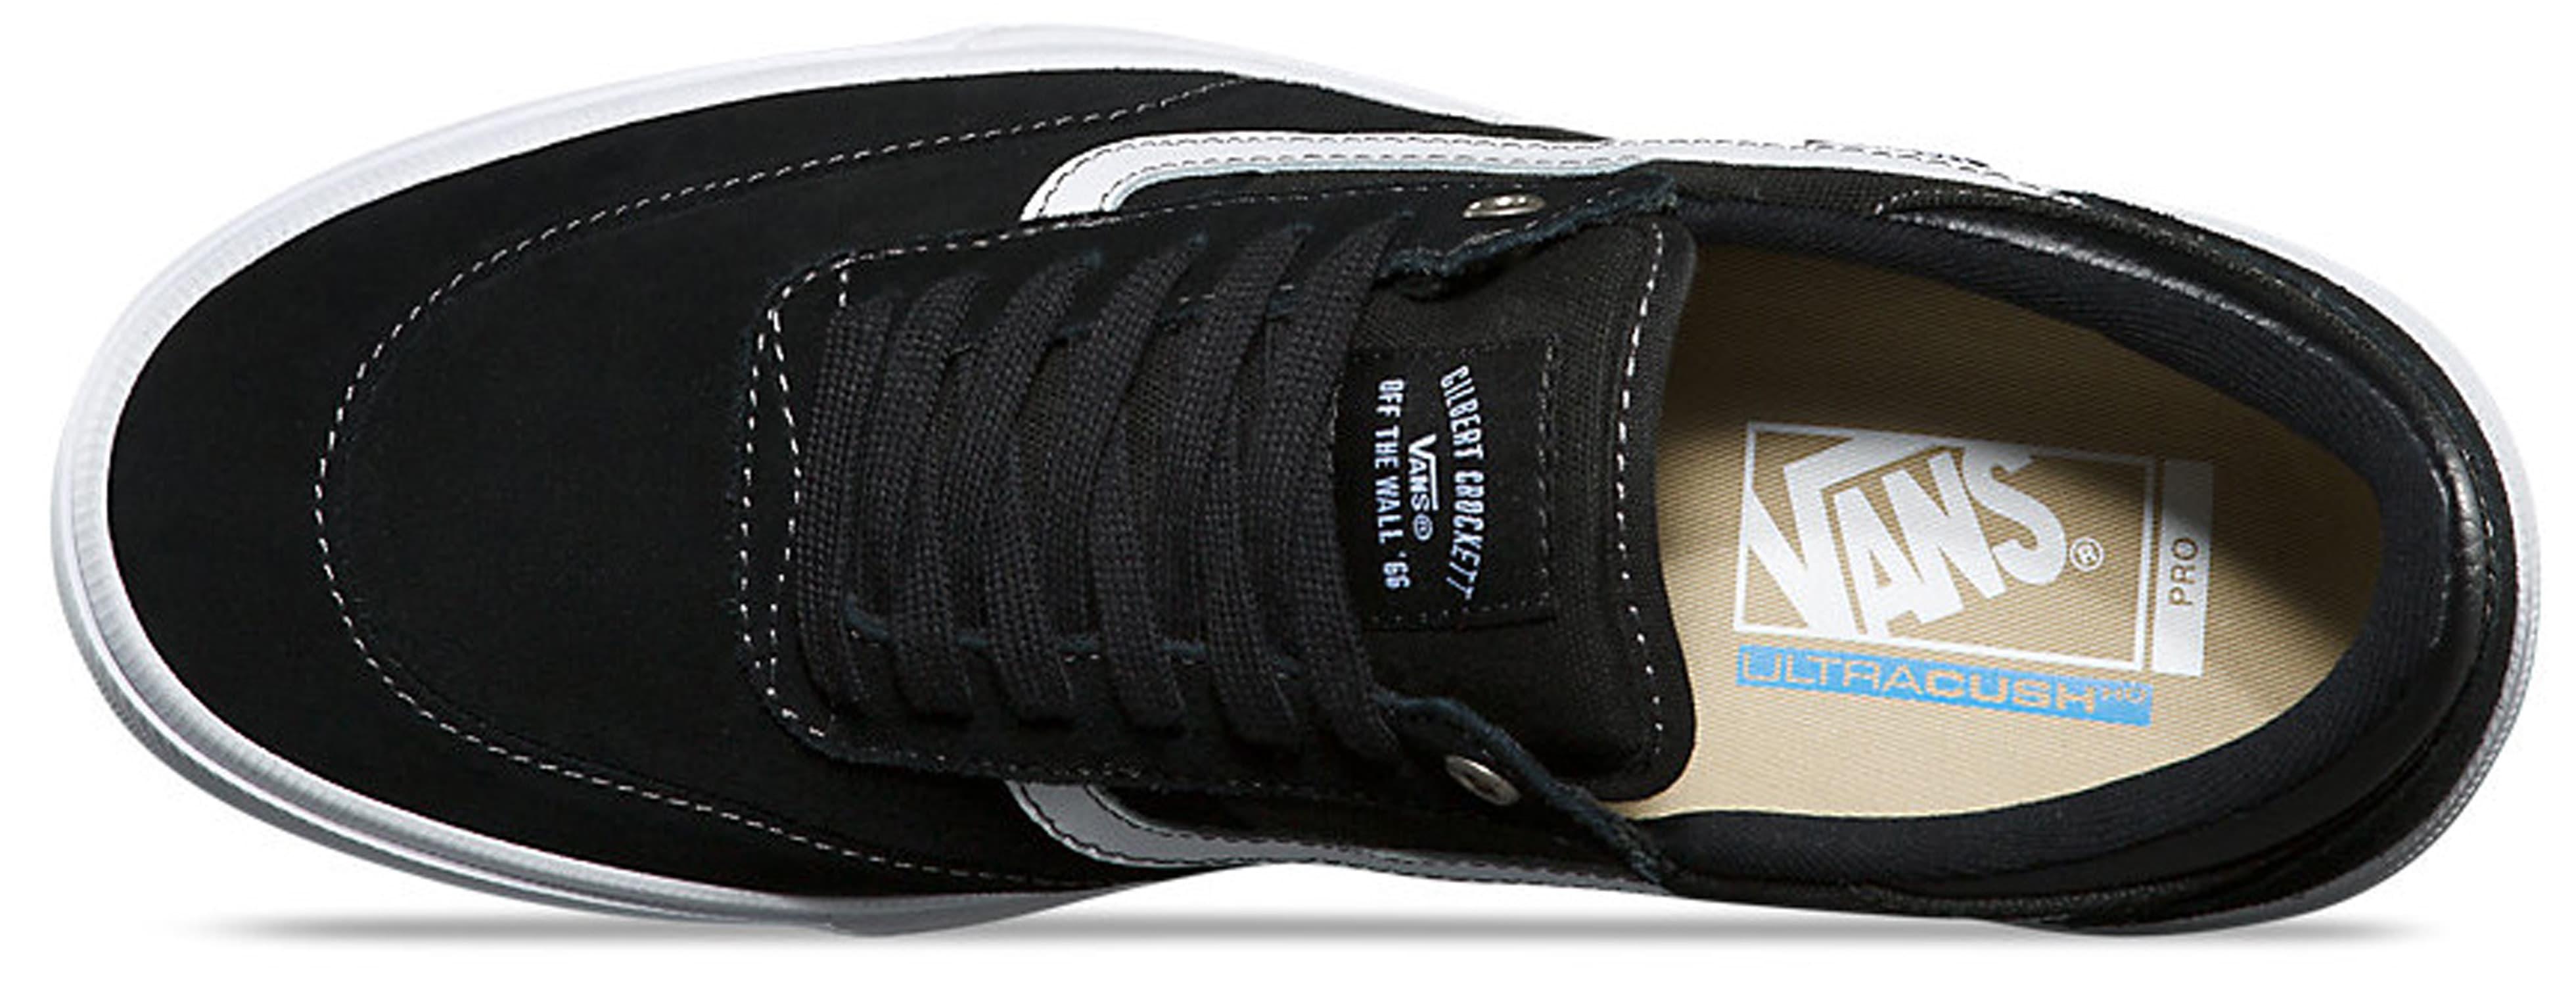 014ebc22df4 Vans Gilbert Crockett Pro 2 Skate Shoes - thumbnail 4